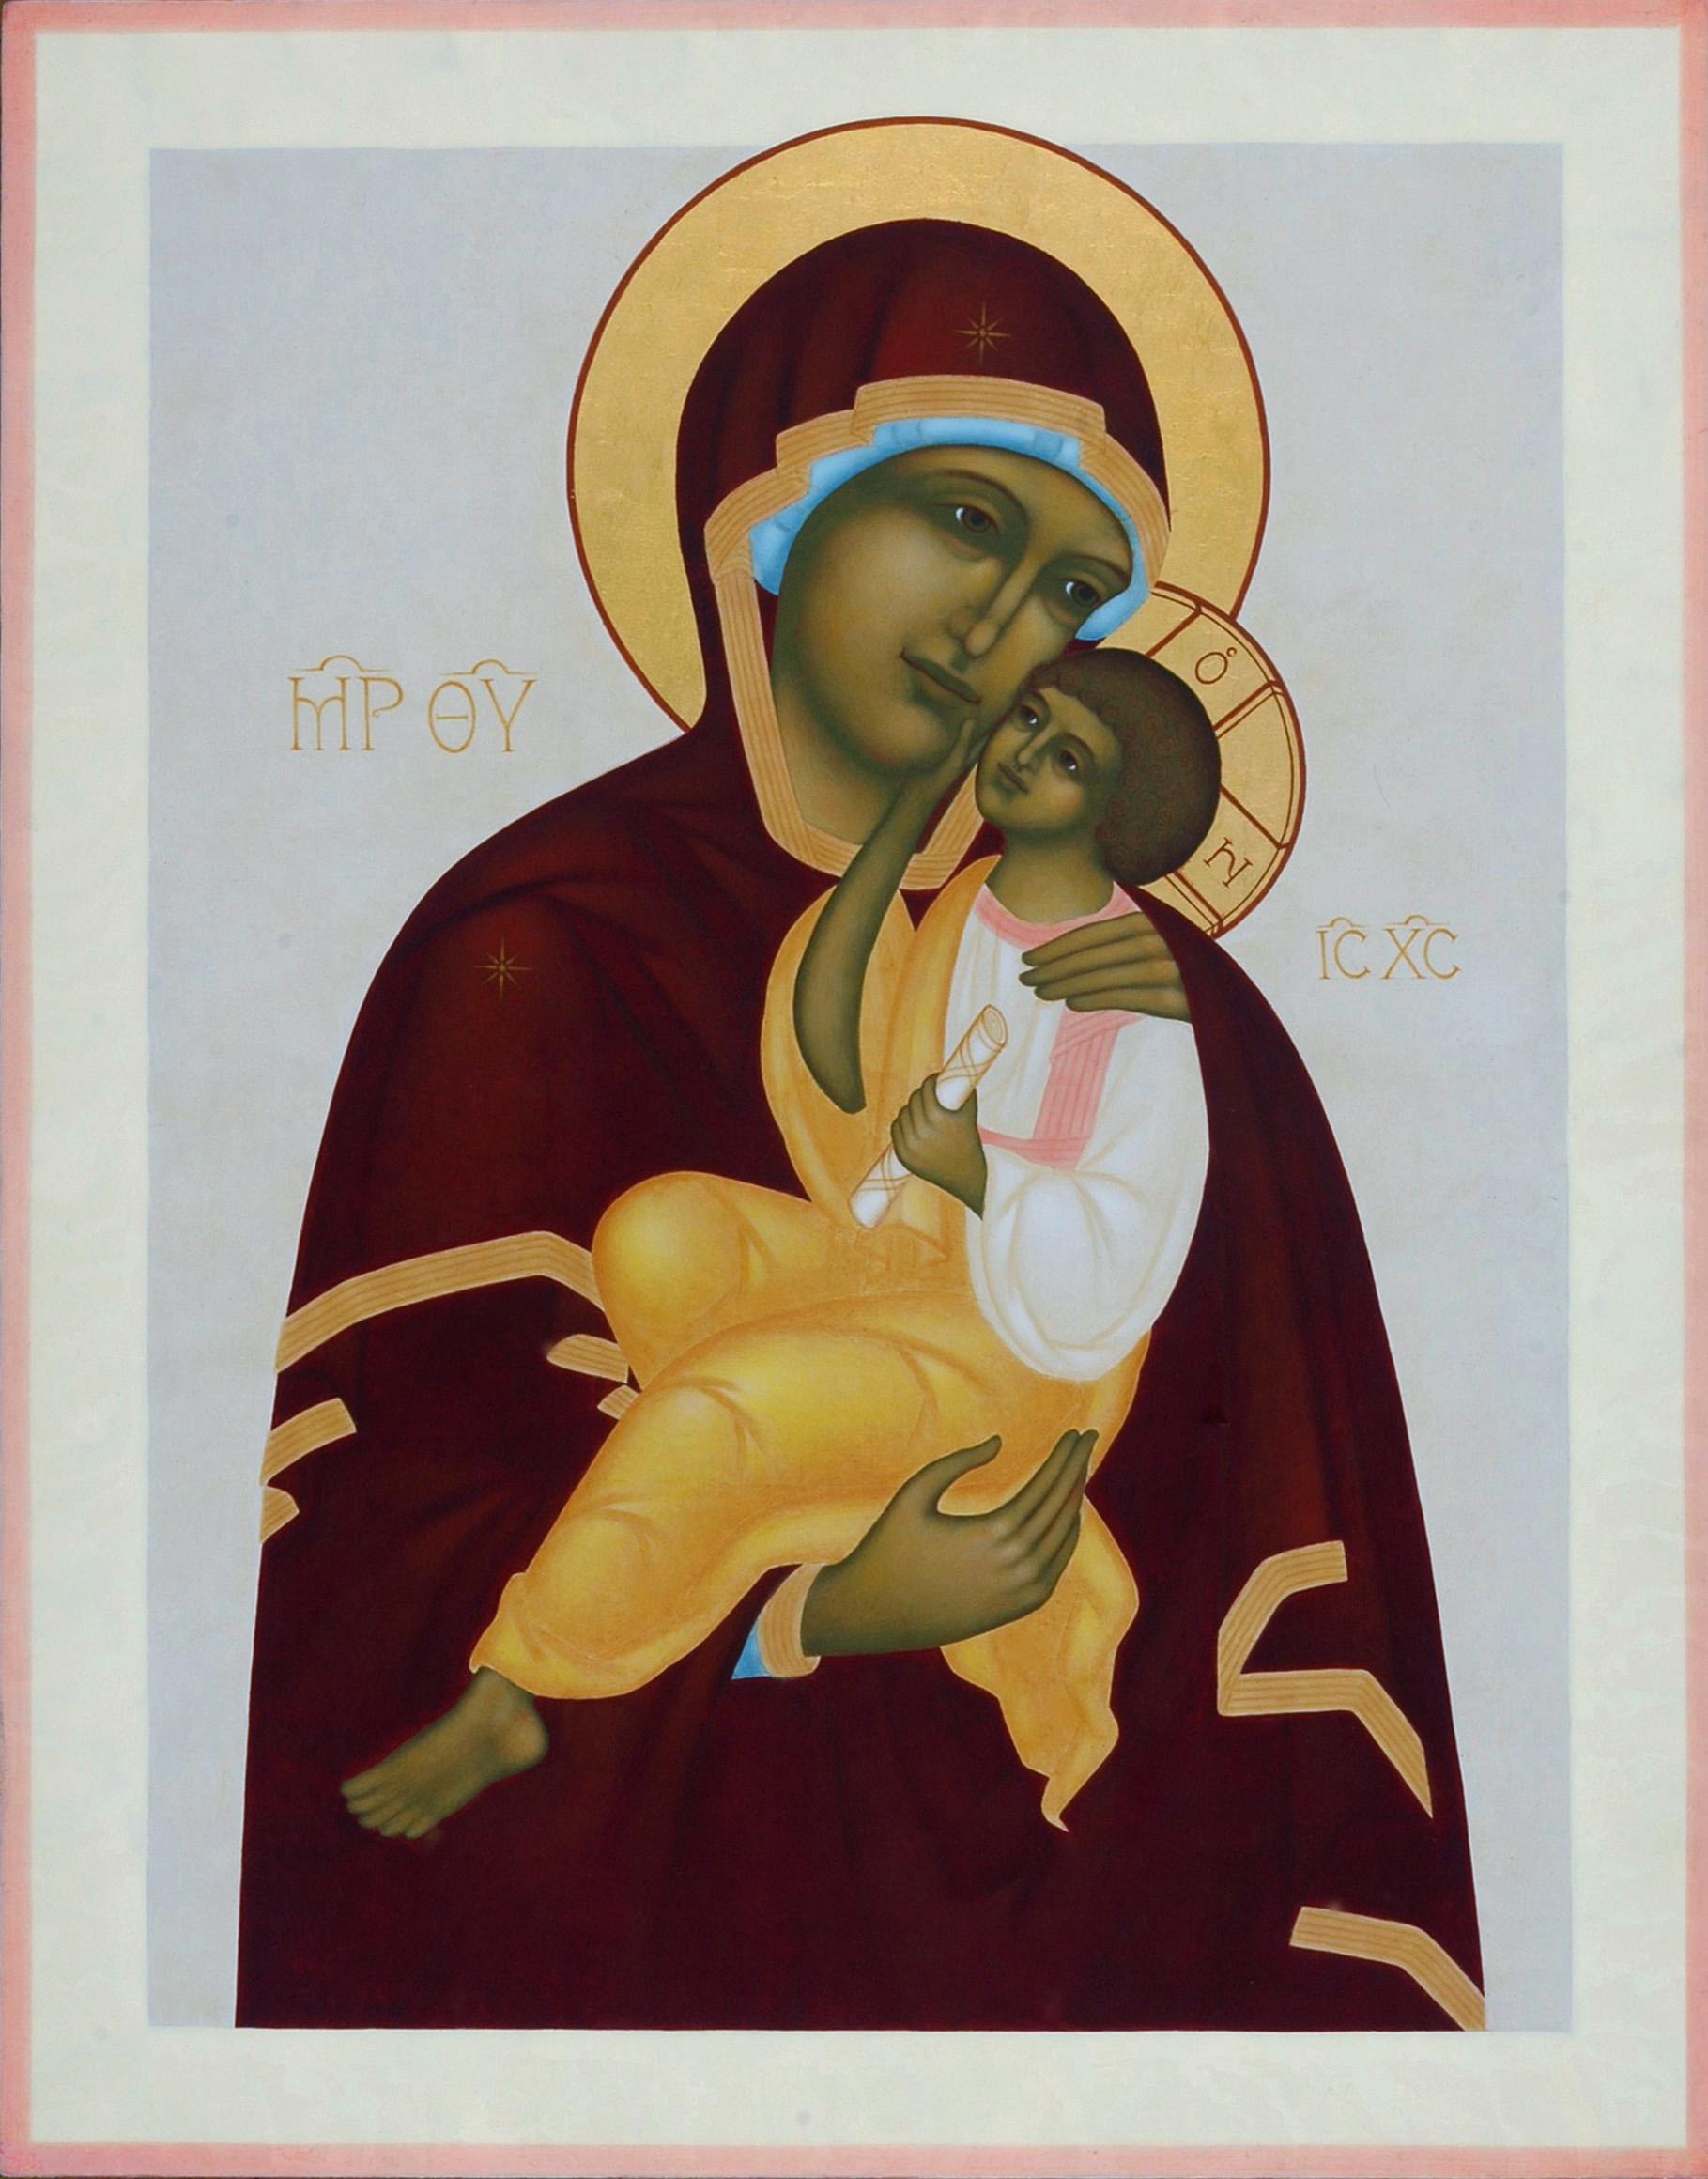 1. Ömhetens Gudsmoder. 2006. 53,5 x 42 cm. Foto Bo Wiberg kopia 2